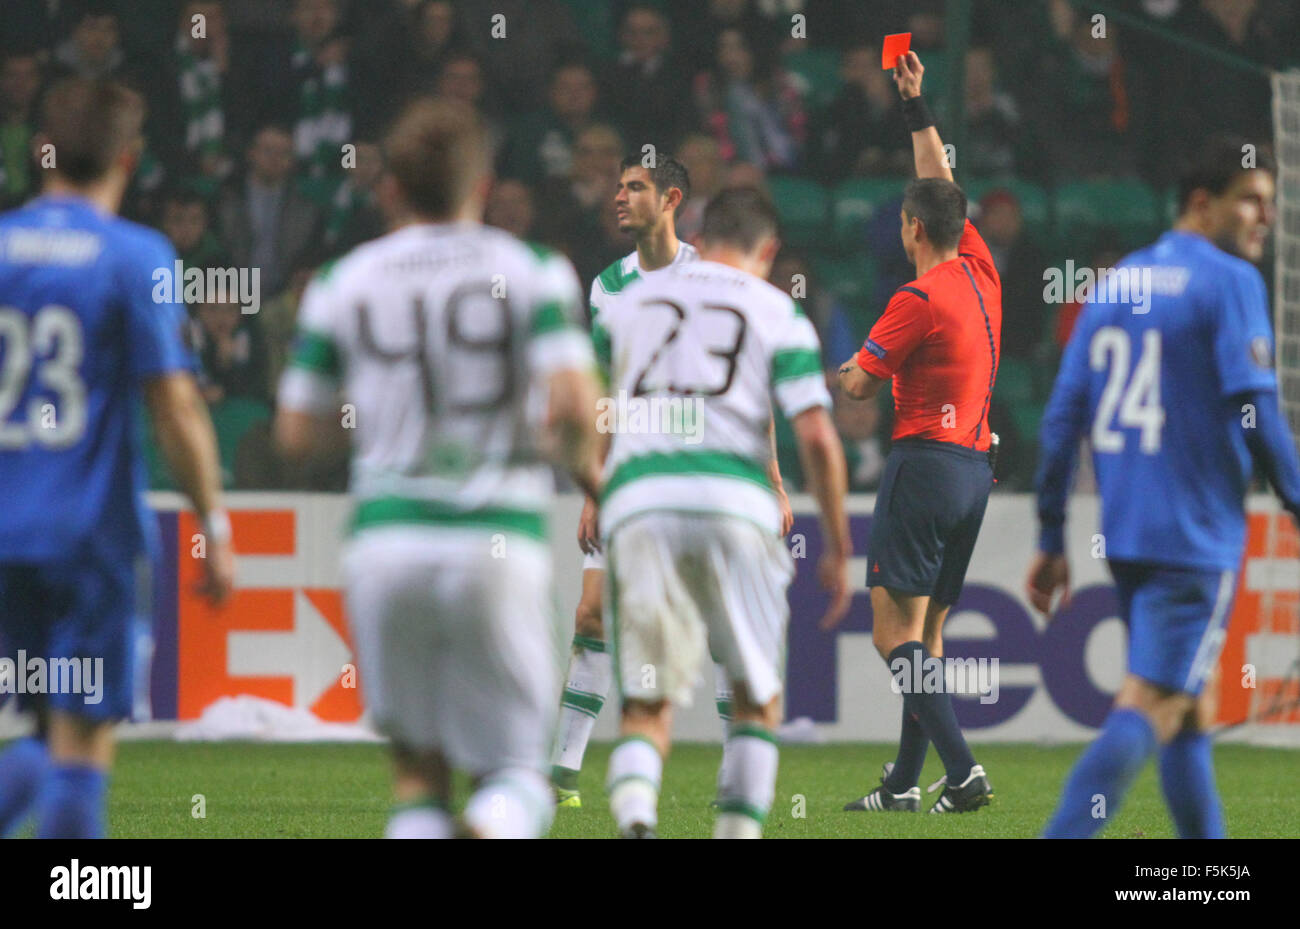 Glasgow, Scotland. 05th Nov, 2015. Europa League. Celtic versus Molde. Nir Bitton receives a red card for his foul - Stock Image